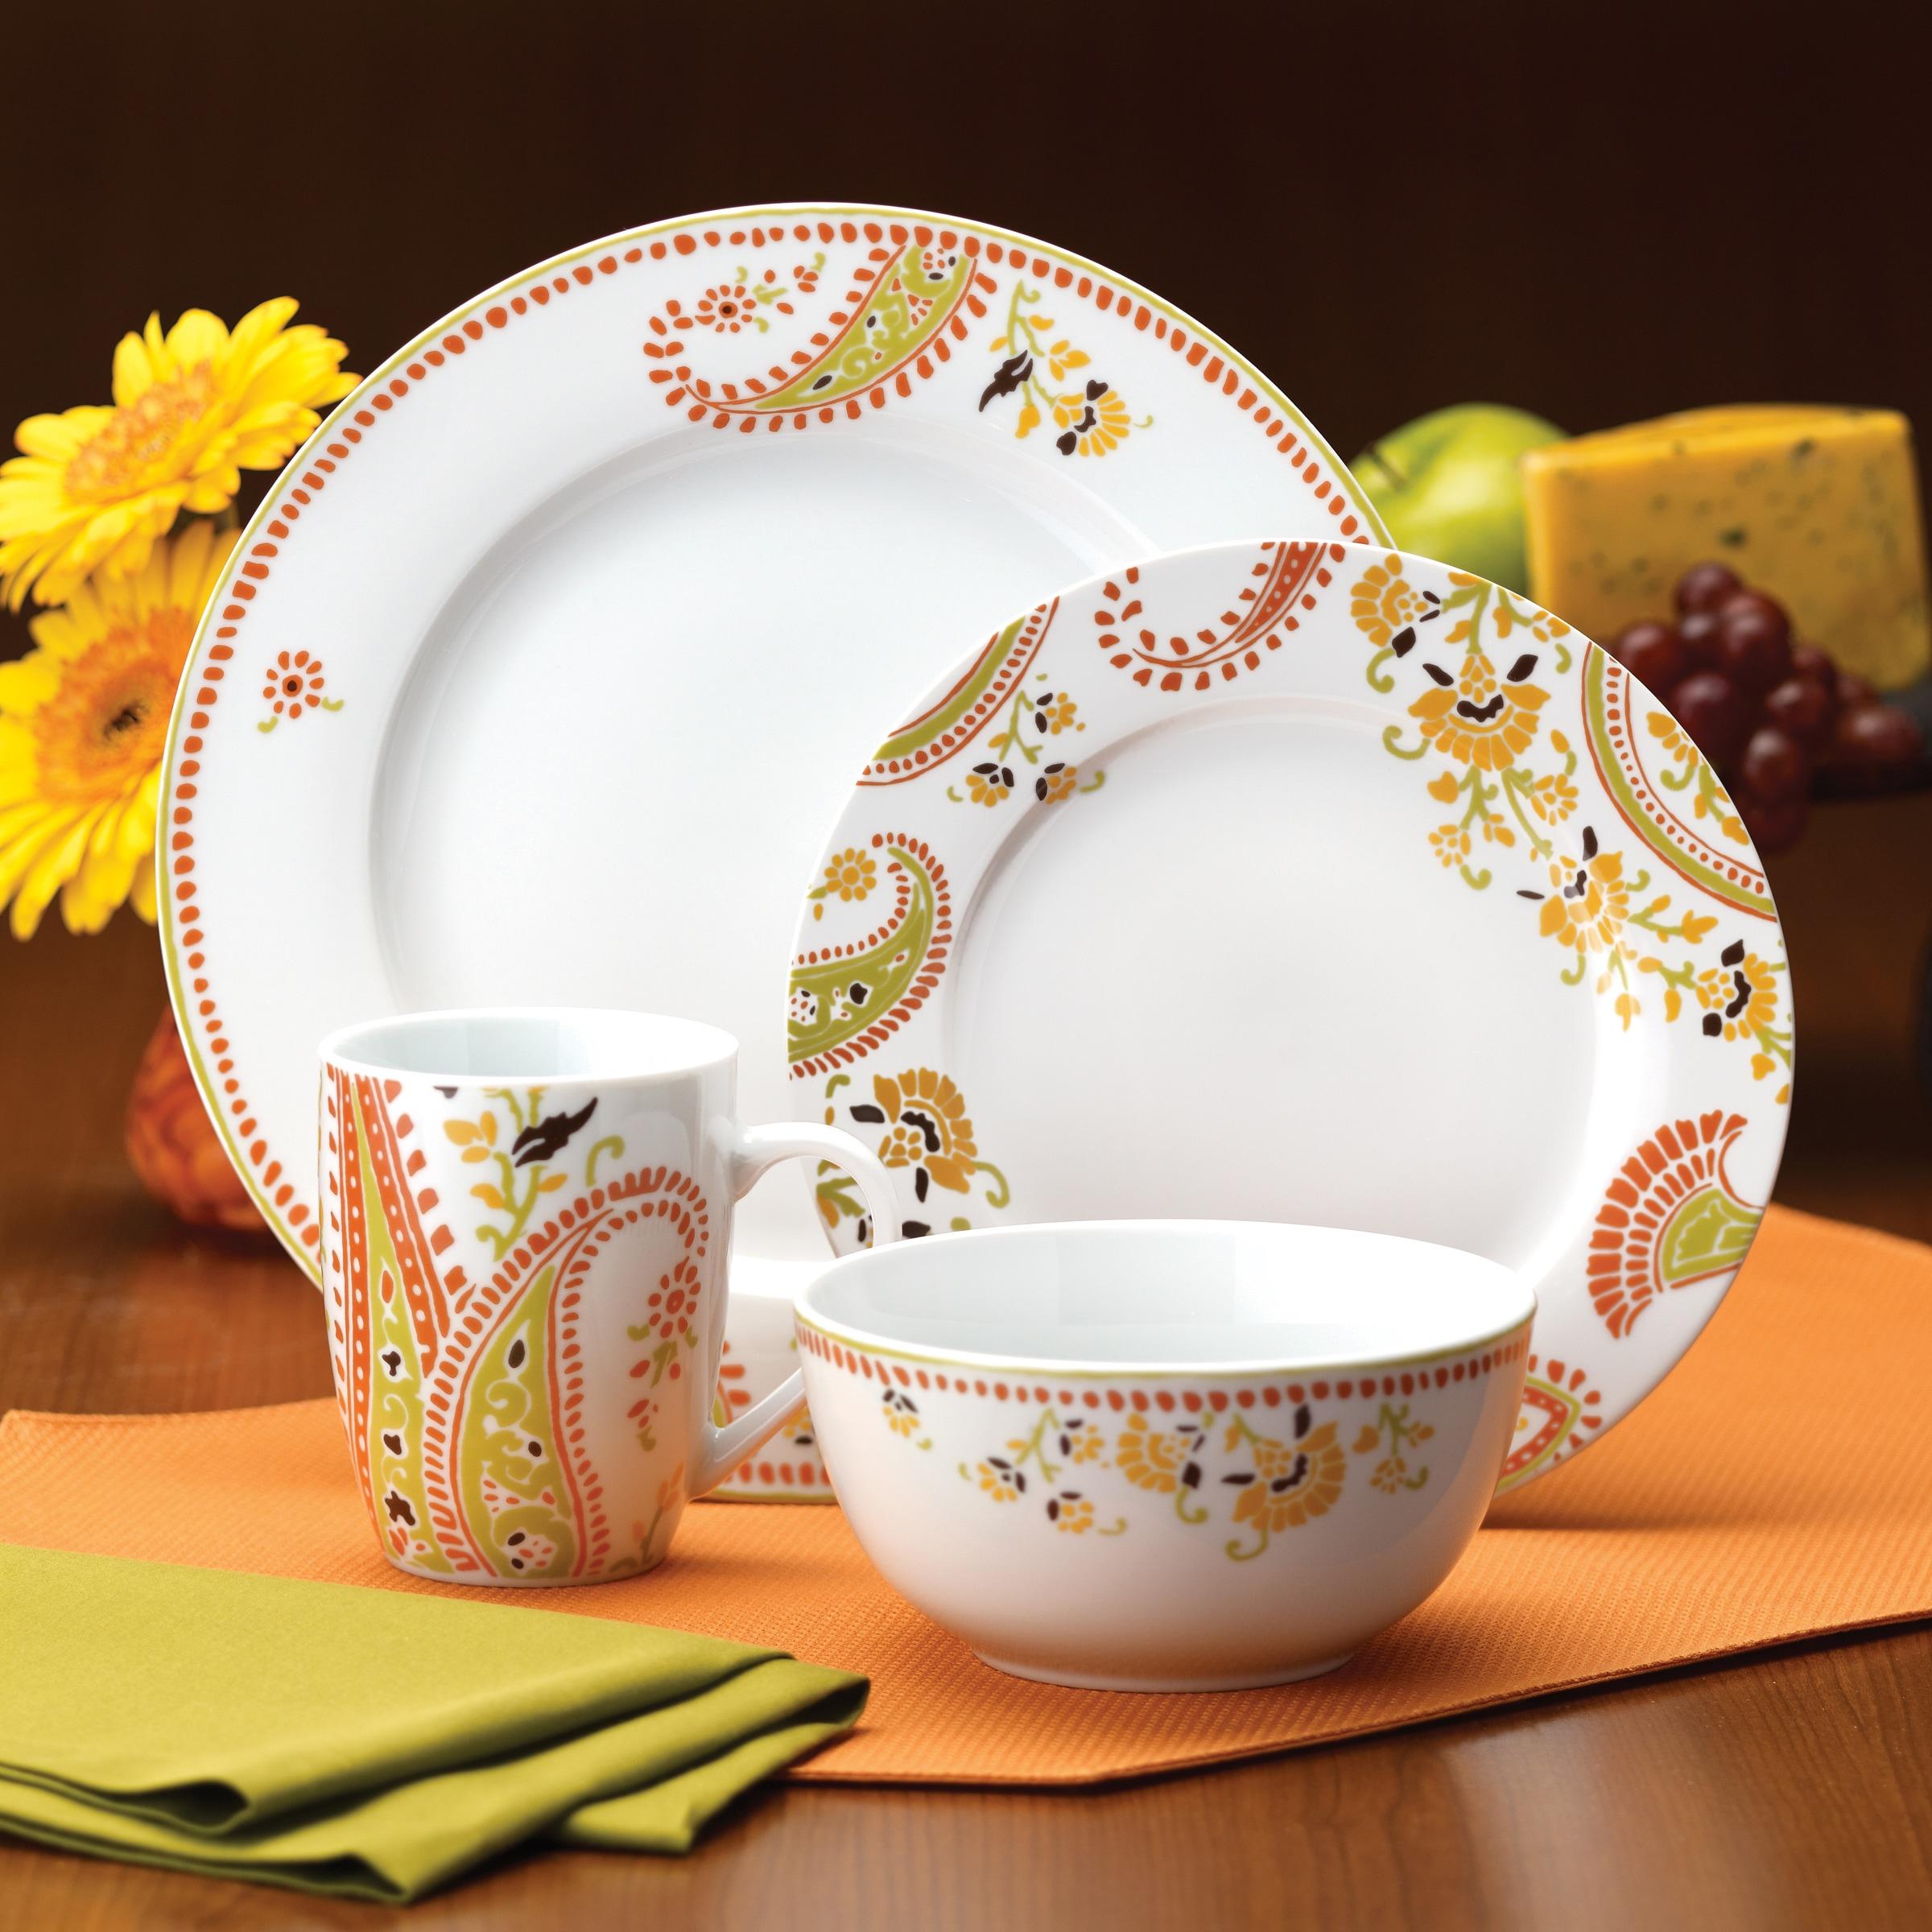 Rachael Ray Dinnerware Paisley 16-piece Porcelain Dinnerware Set - Free Shipping Today - Overstock - 13906650 & Rachael Ray Dinnerware Paisley 16-piece Porcelain Dinnerware Set ...